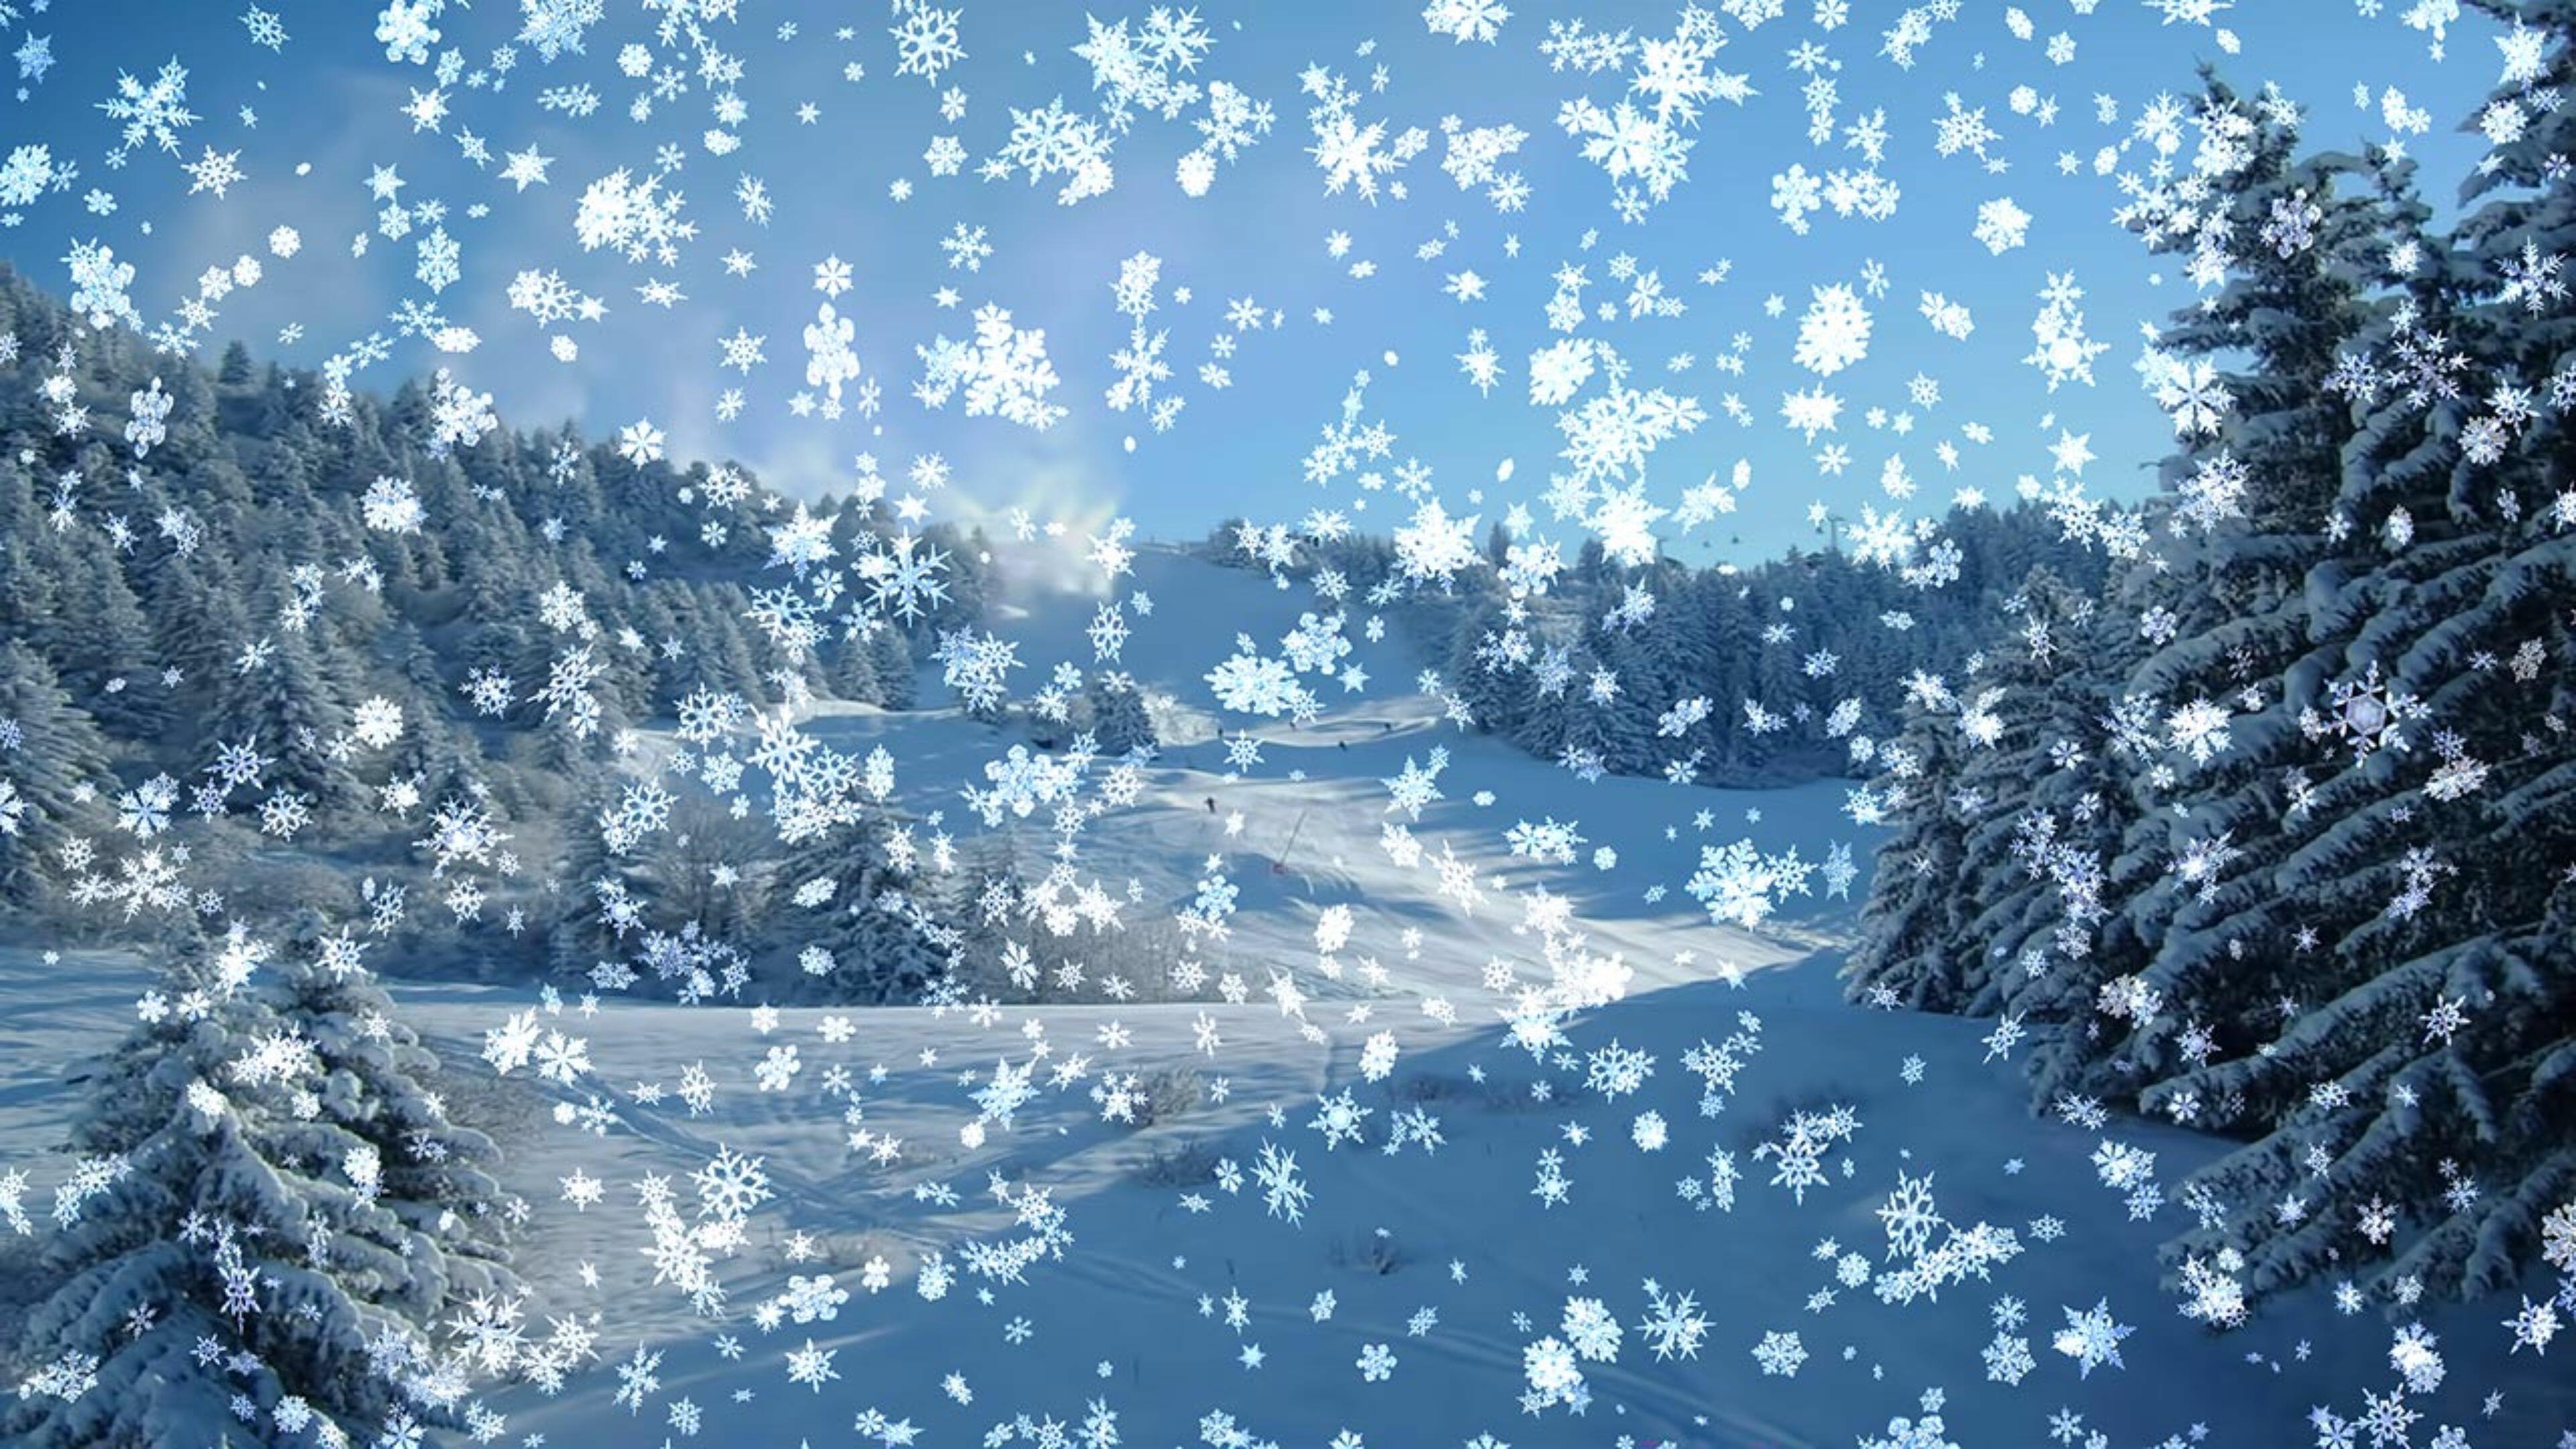 Заставки На Телефон Живые Обои Зима